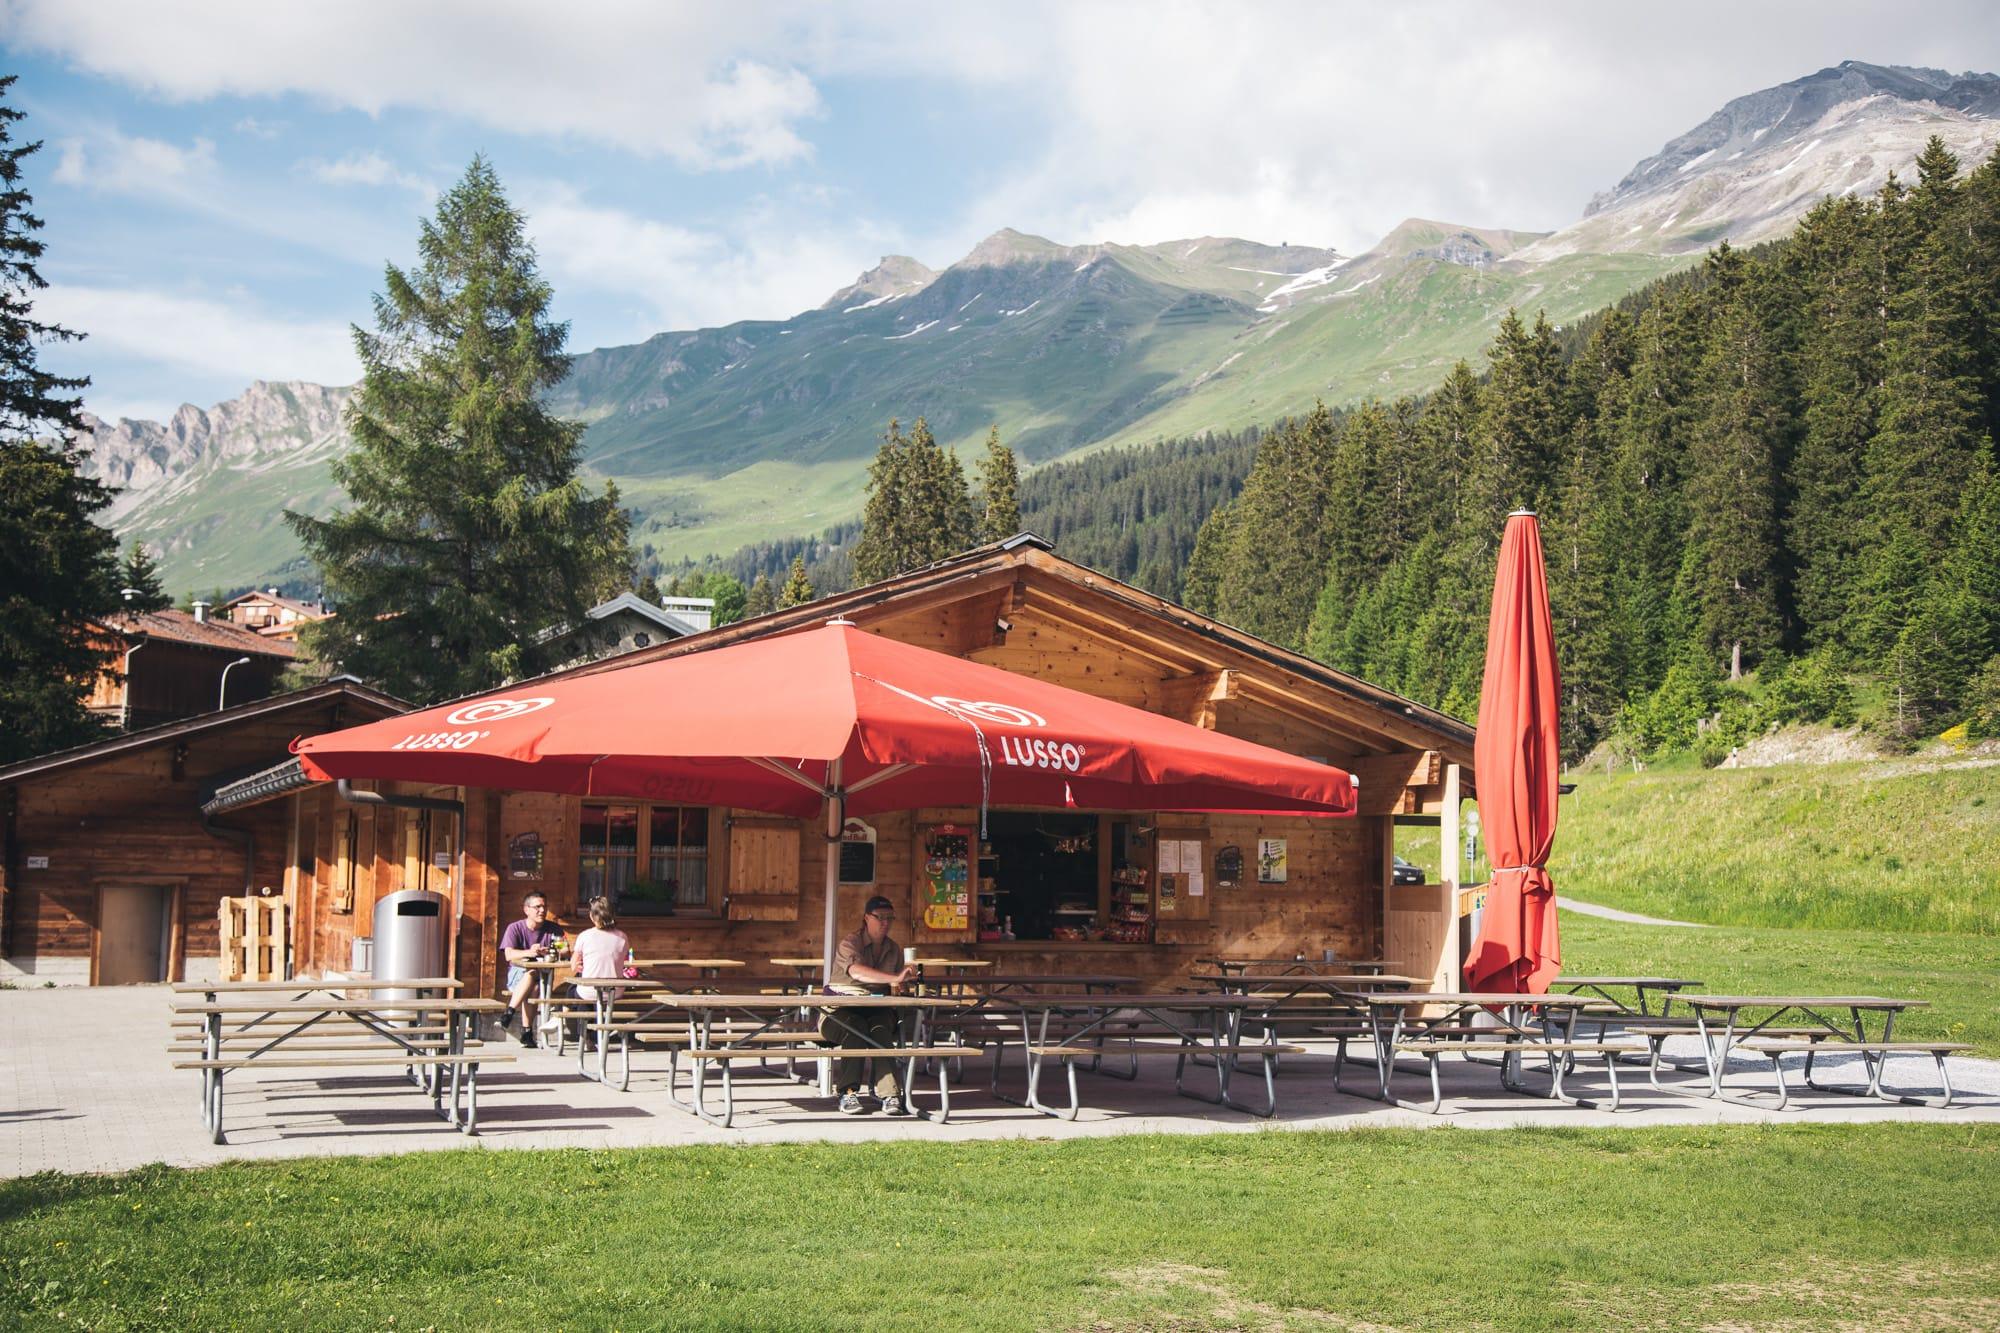 Kiosk Canols am Heidsee, Valbella GR